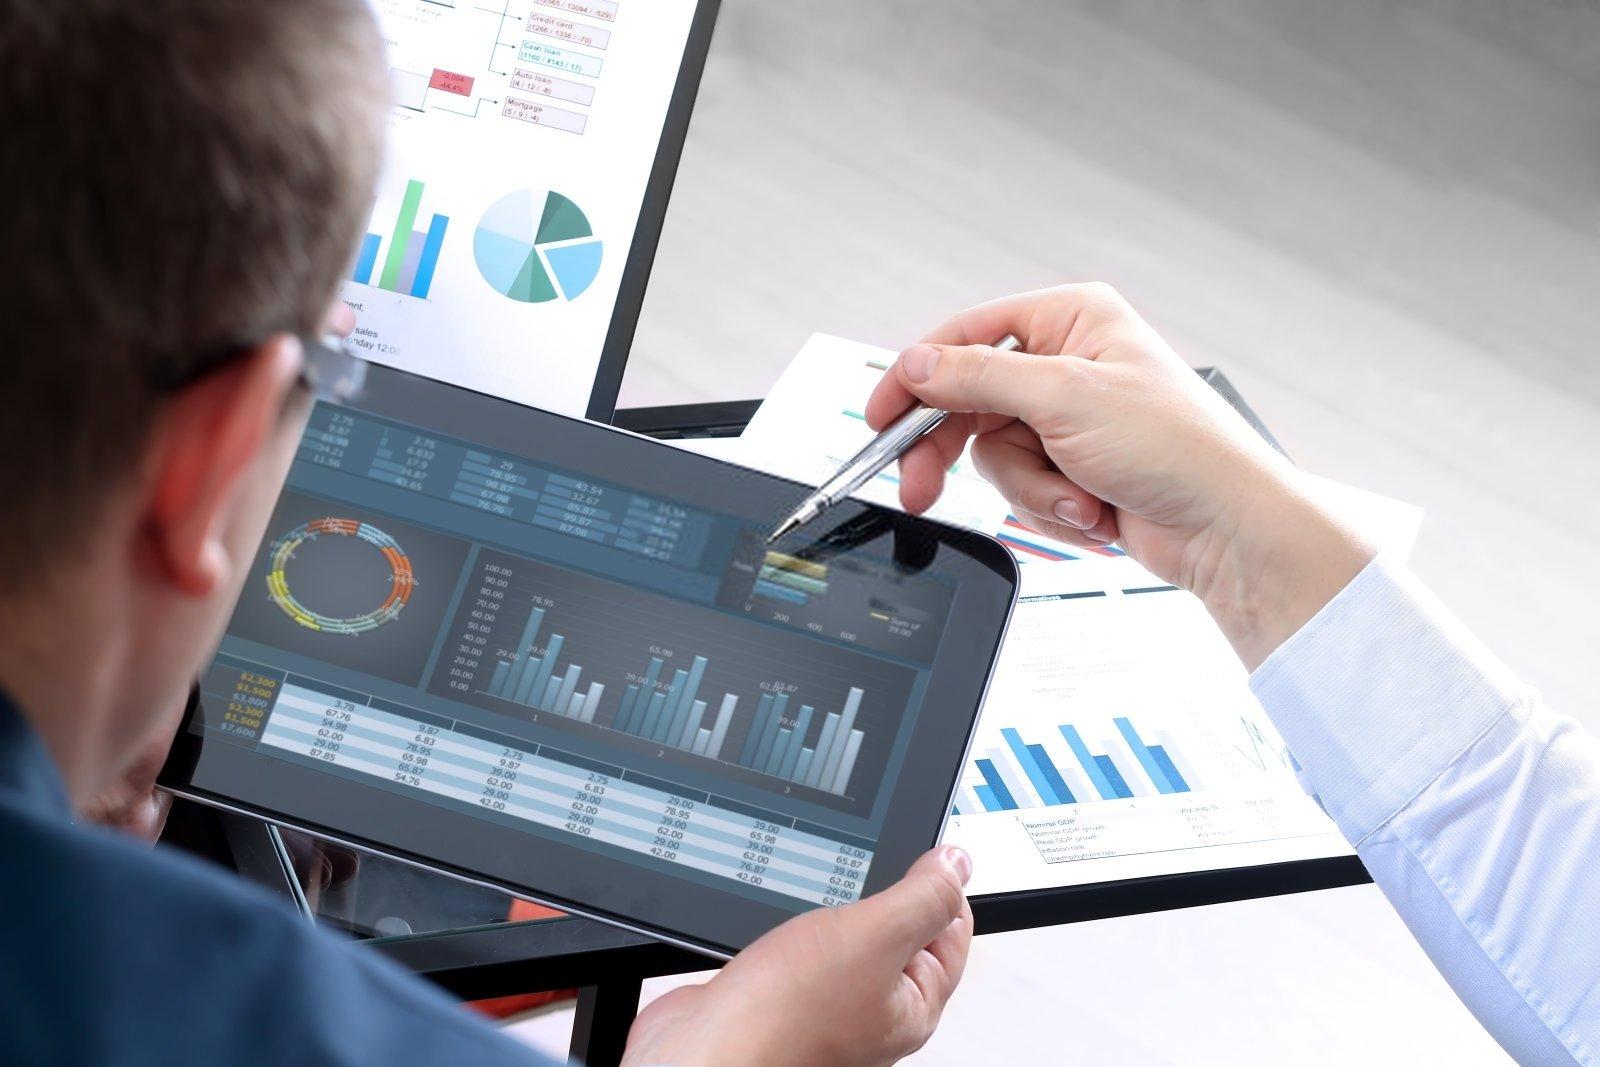 bigstock-Business-Concept-Desktop-Comp-336309055